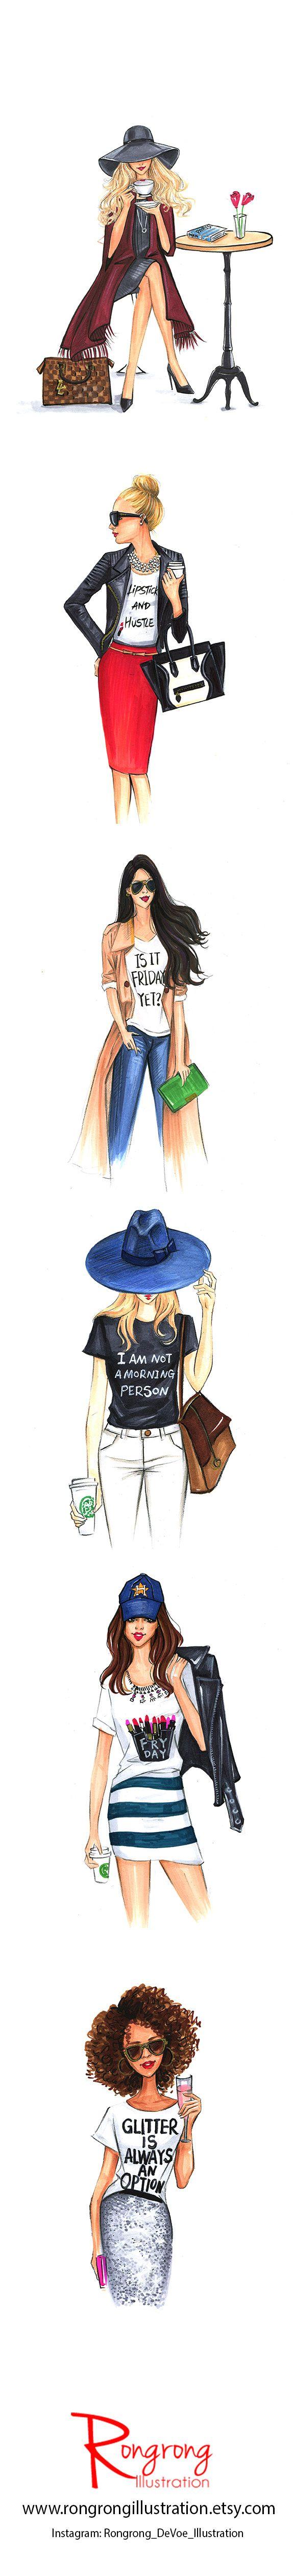 Photo of Fashion illustration & Gift for Girl Boss by RongrongIllustration